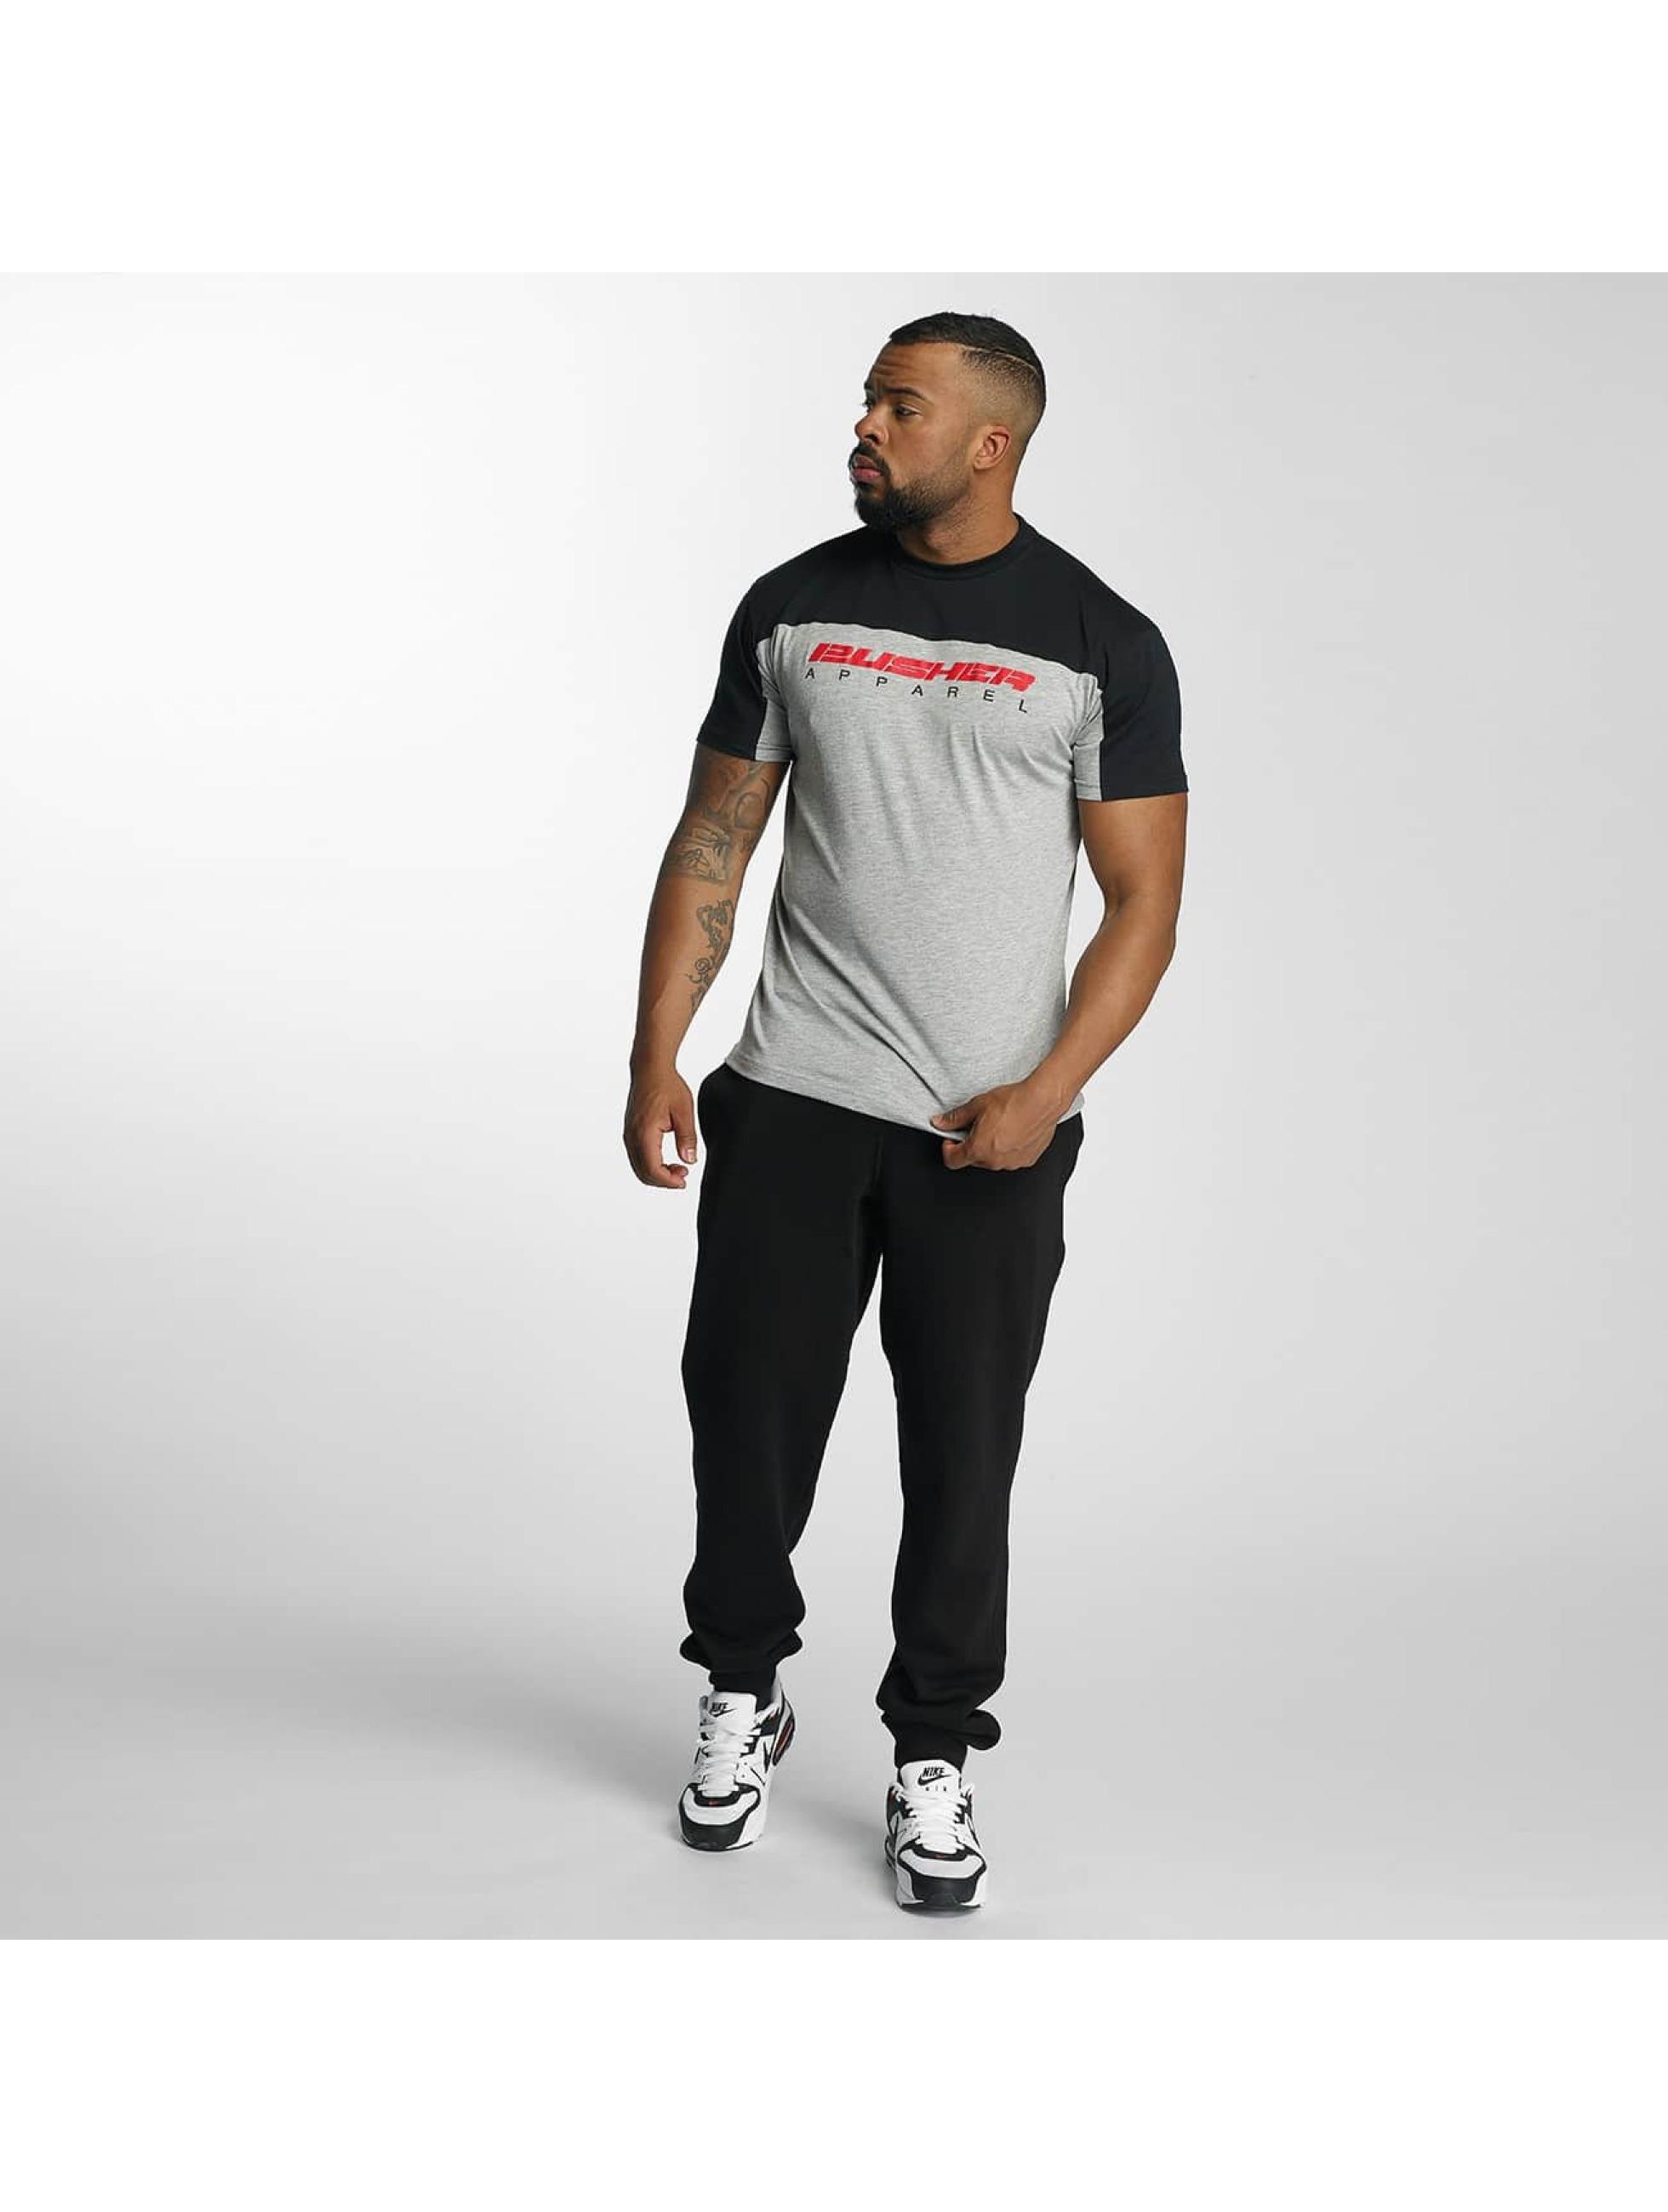 Pusher Apparel T-Shirt 137 Riot gray